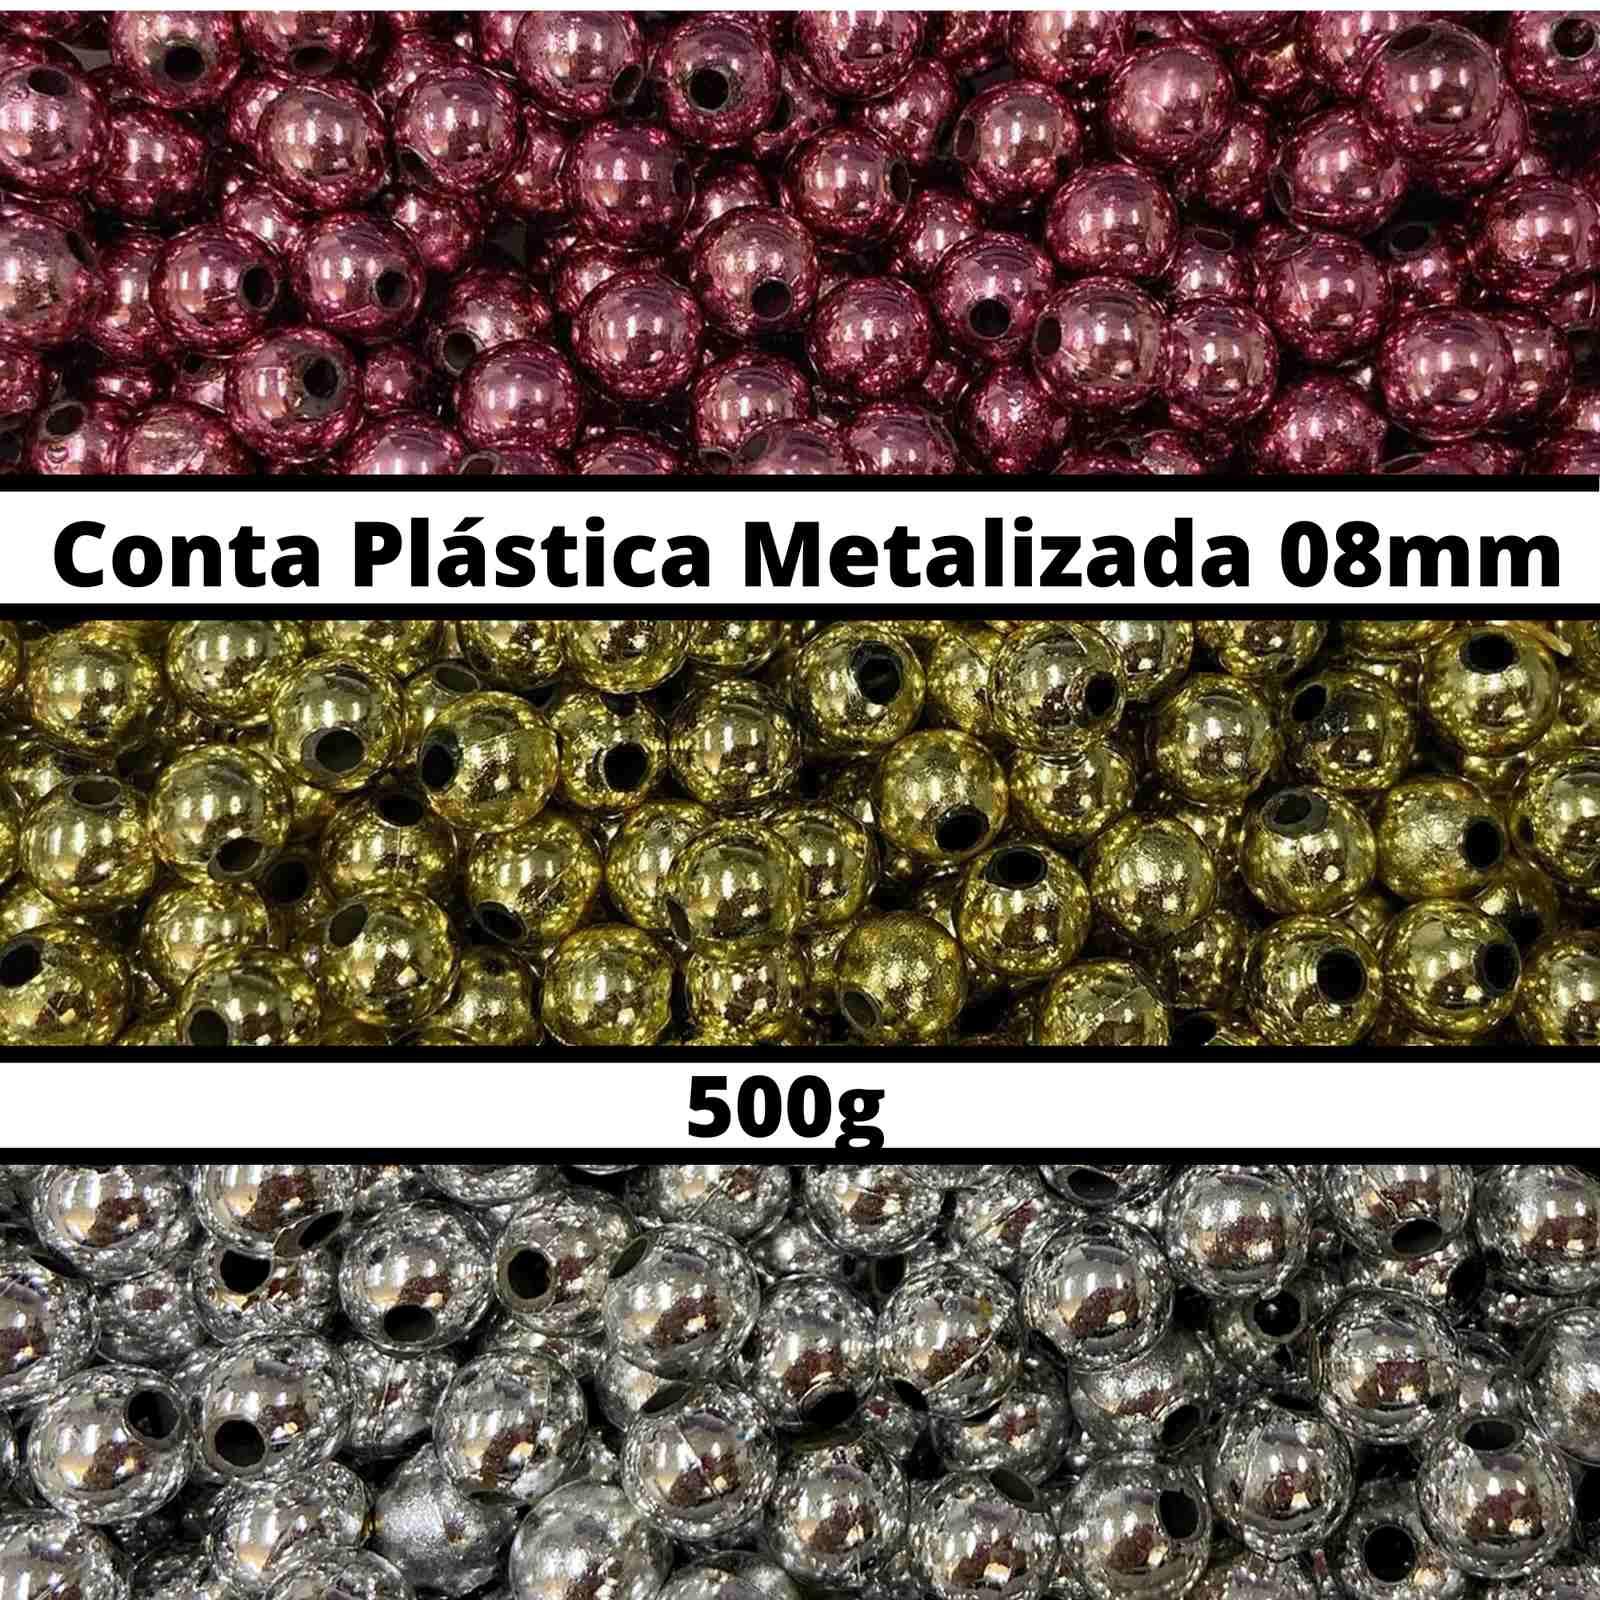 Conta Plástica Metalizada 08mm - 500g